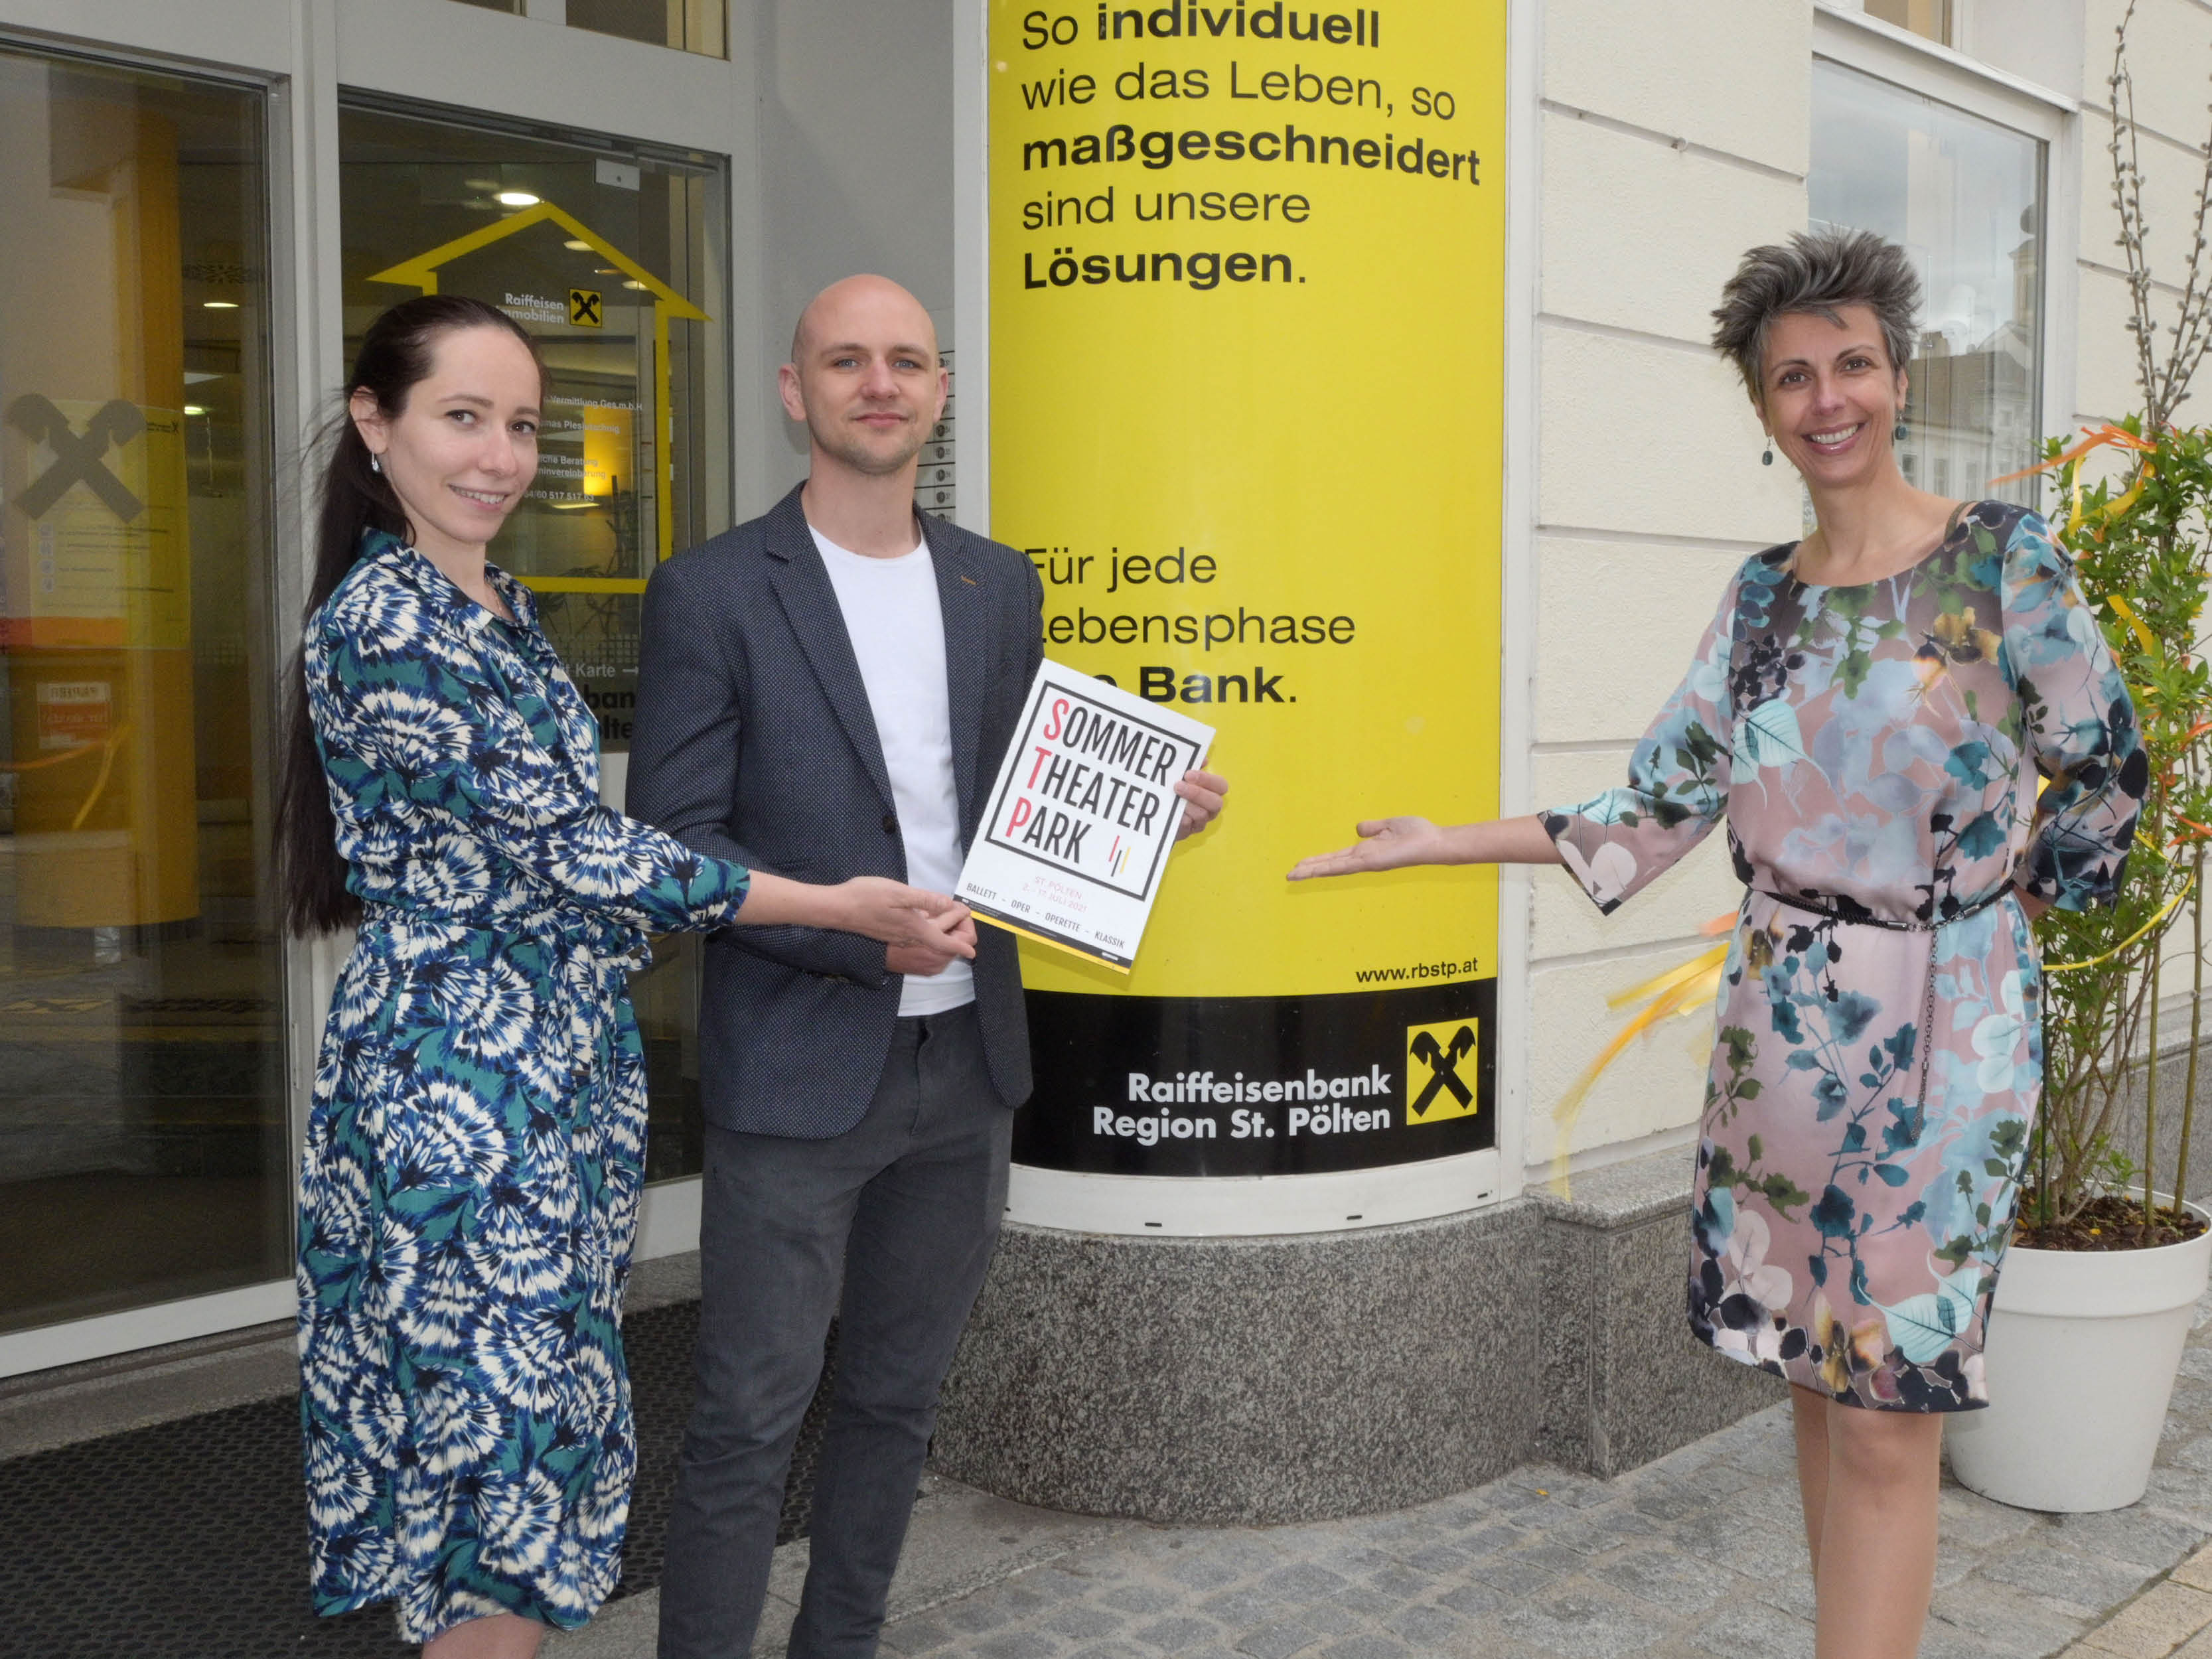 Raiffeisenbank als Partner